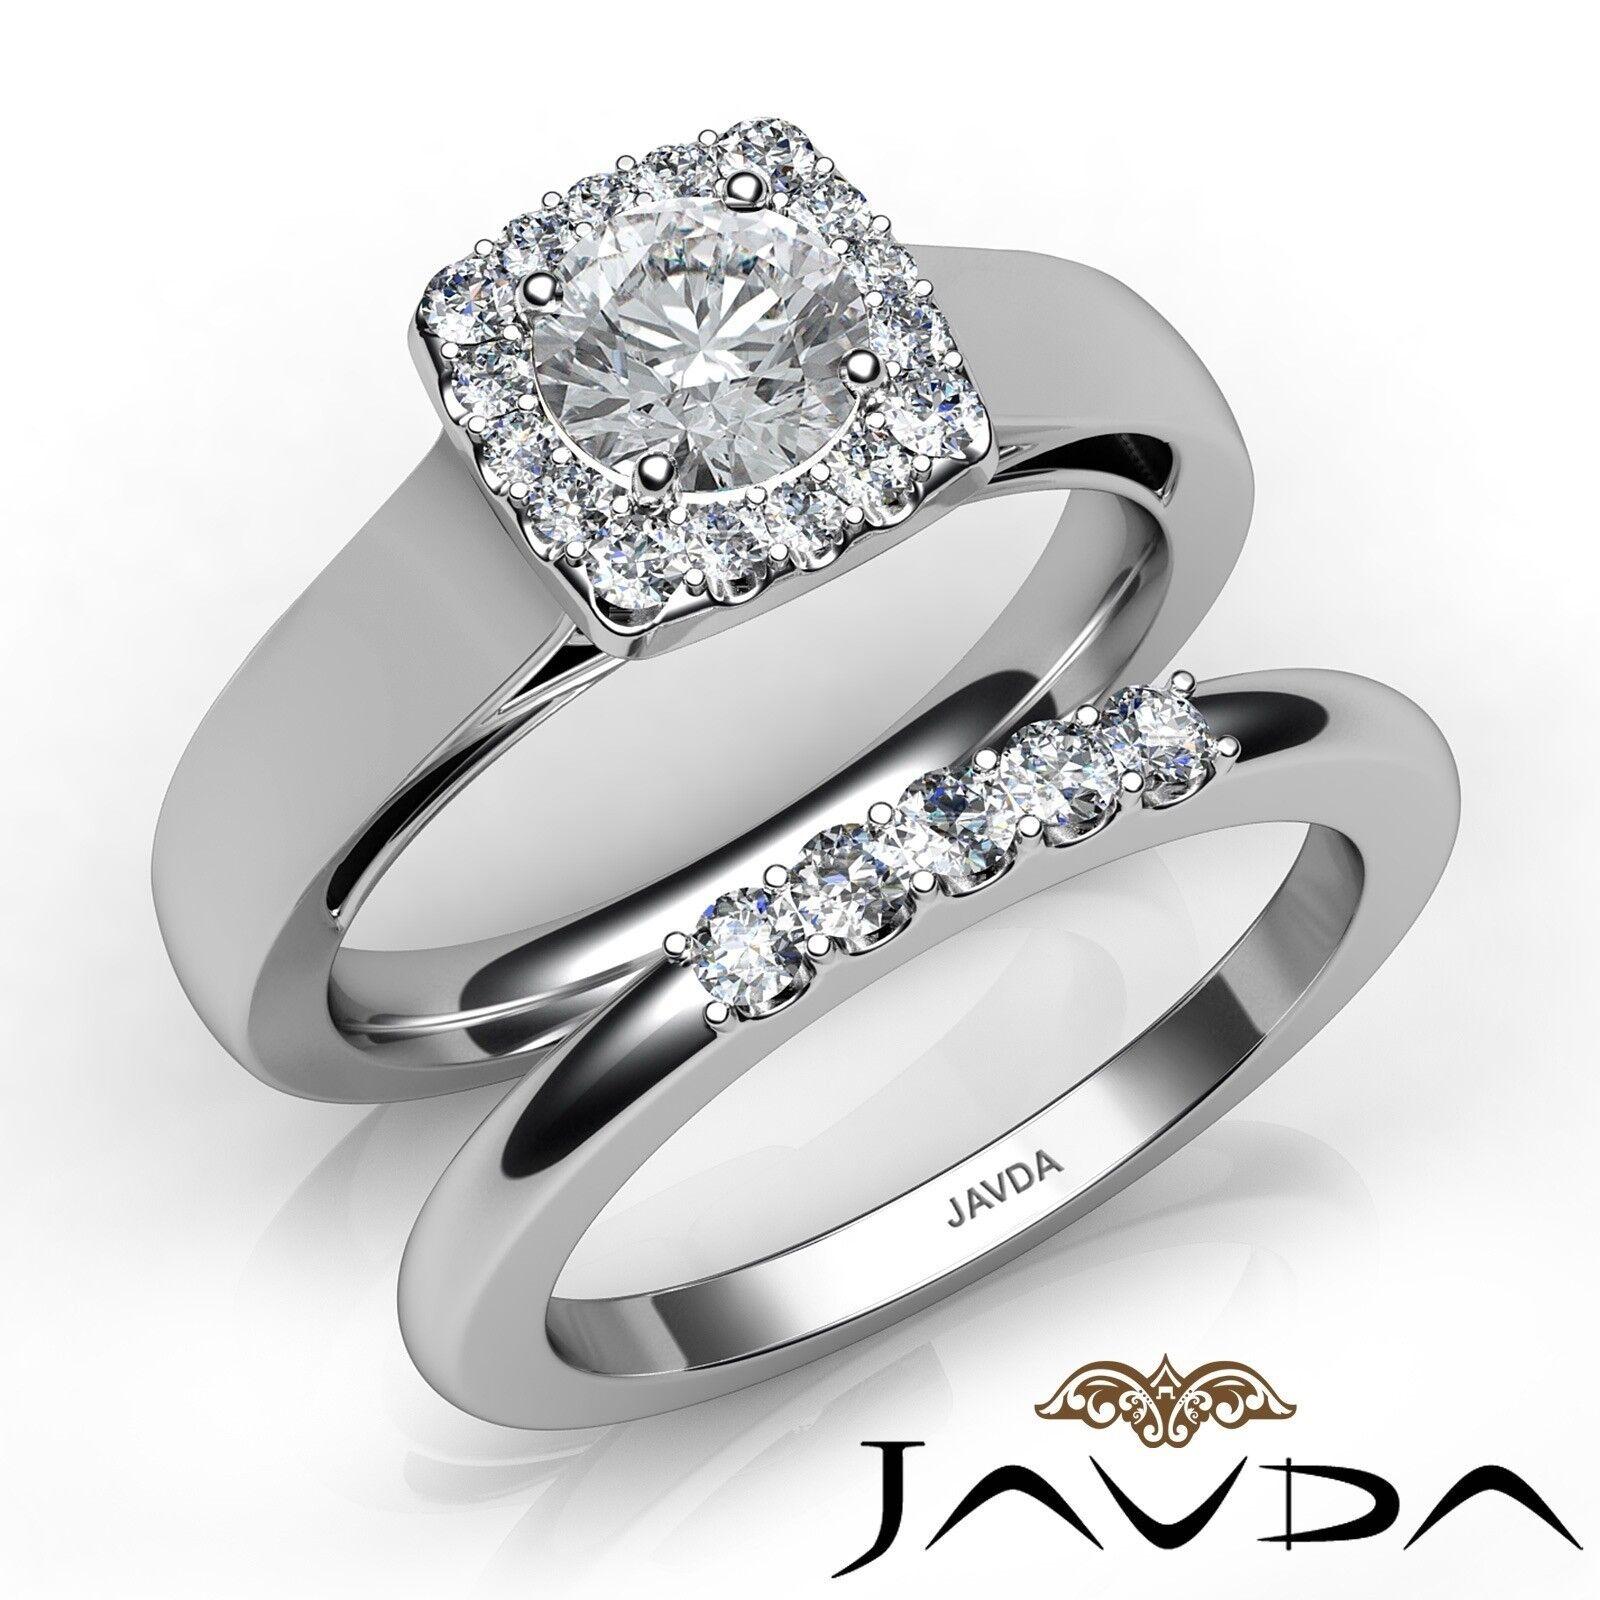 1.15ctw Halo Filigree Bridal Set Round Diamond Engagement Ring GIA G-SI1 W Gold